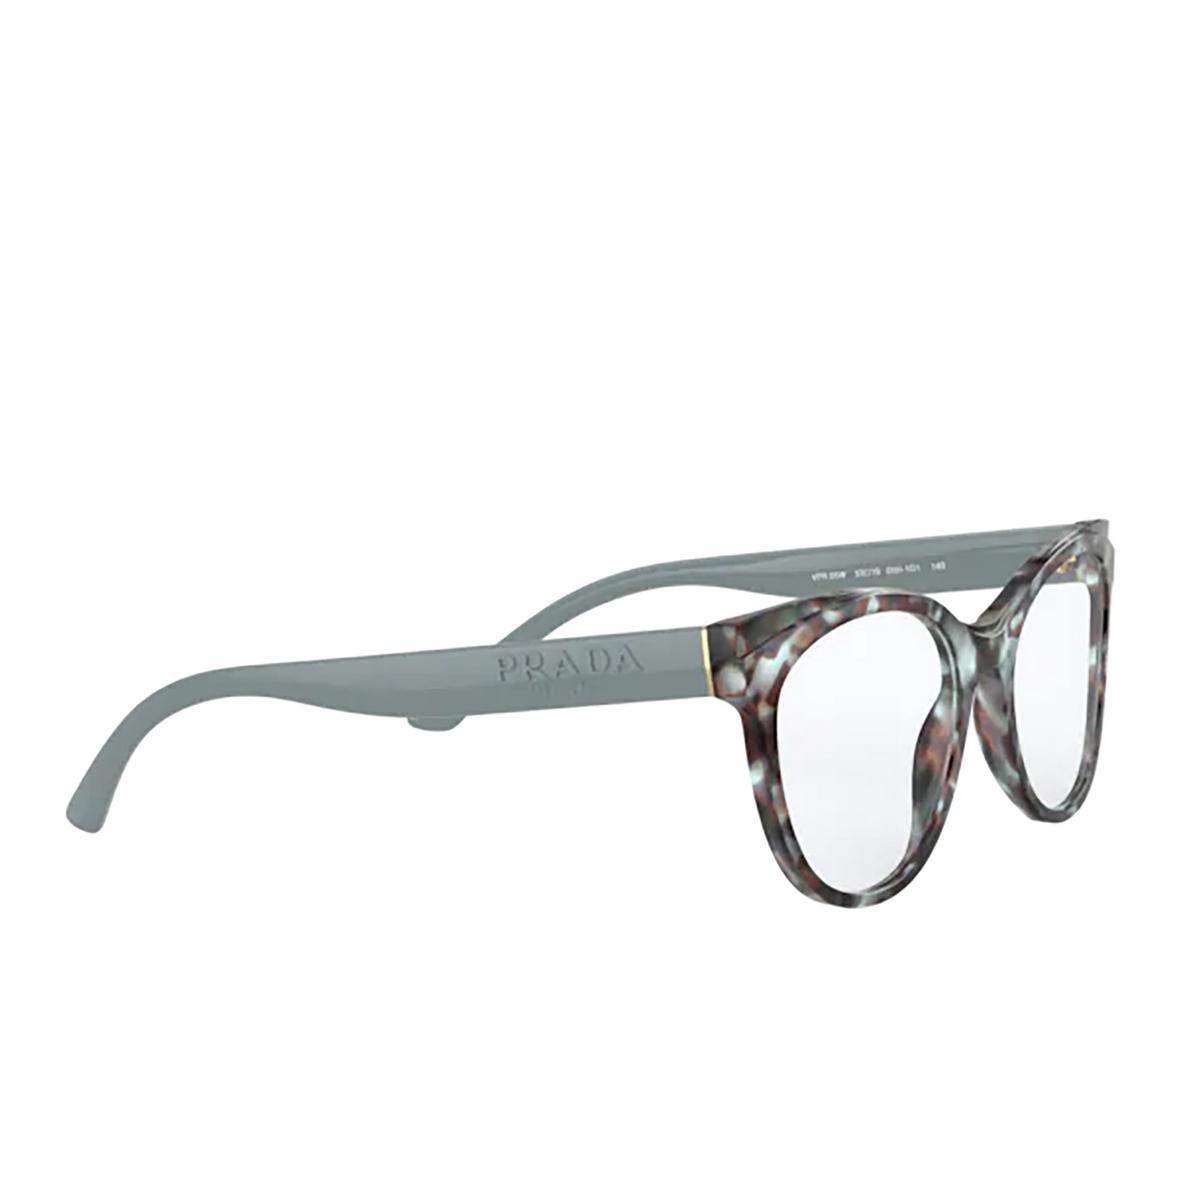 Prada® Butterfly Eyeglasses: PR 05WV color Blue / Brown 05H1O1 - three-quarters view.